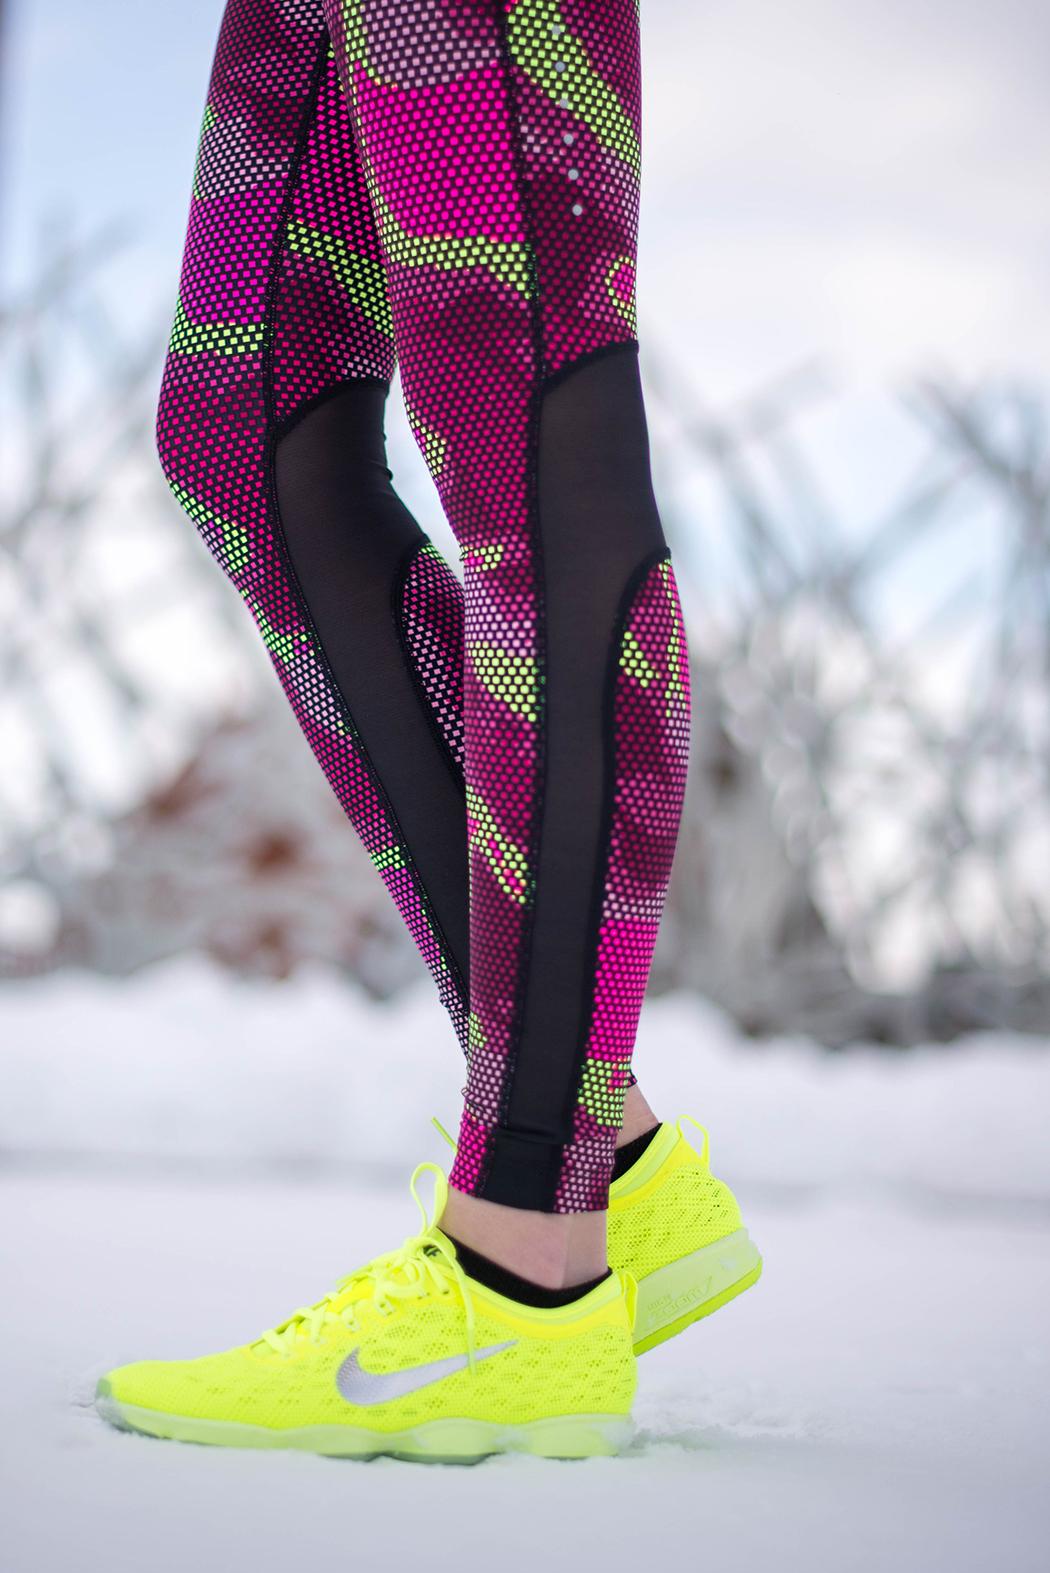 Lindarella-Fitnessblogger-Deutschland-München-Nike-Trainingsoutfit-neongelbe-Sportschuhe-Fitnessblog-Workoutgear-7